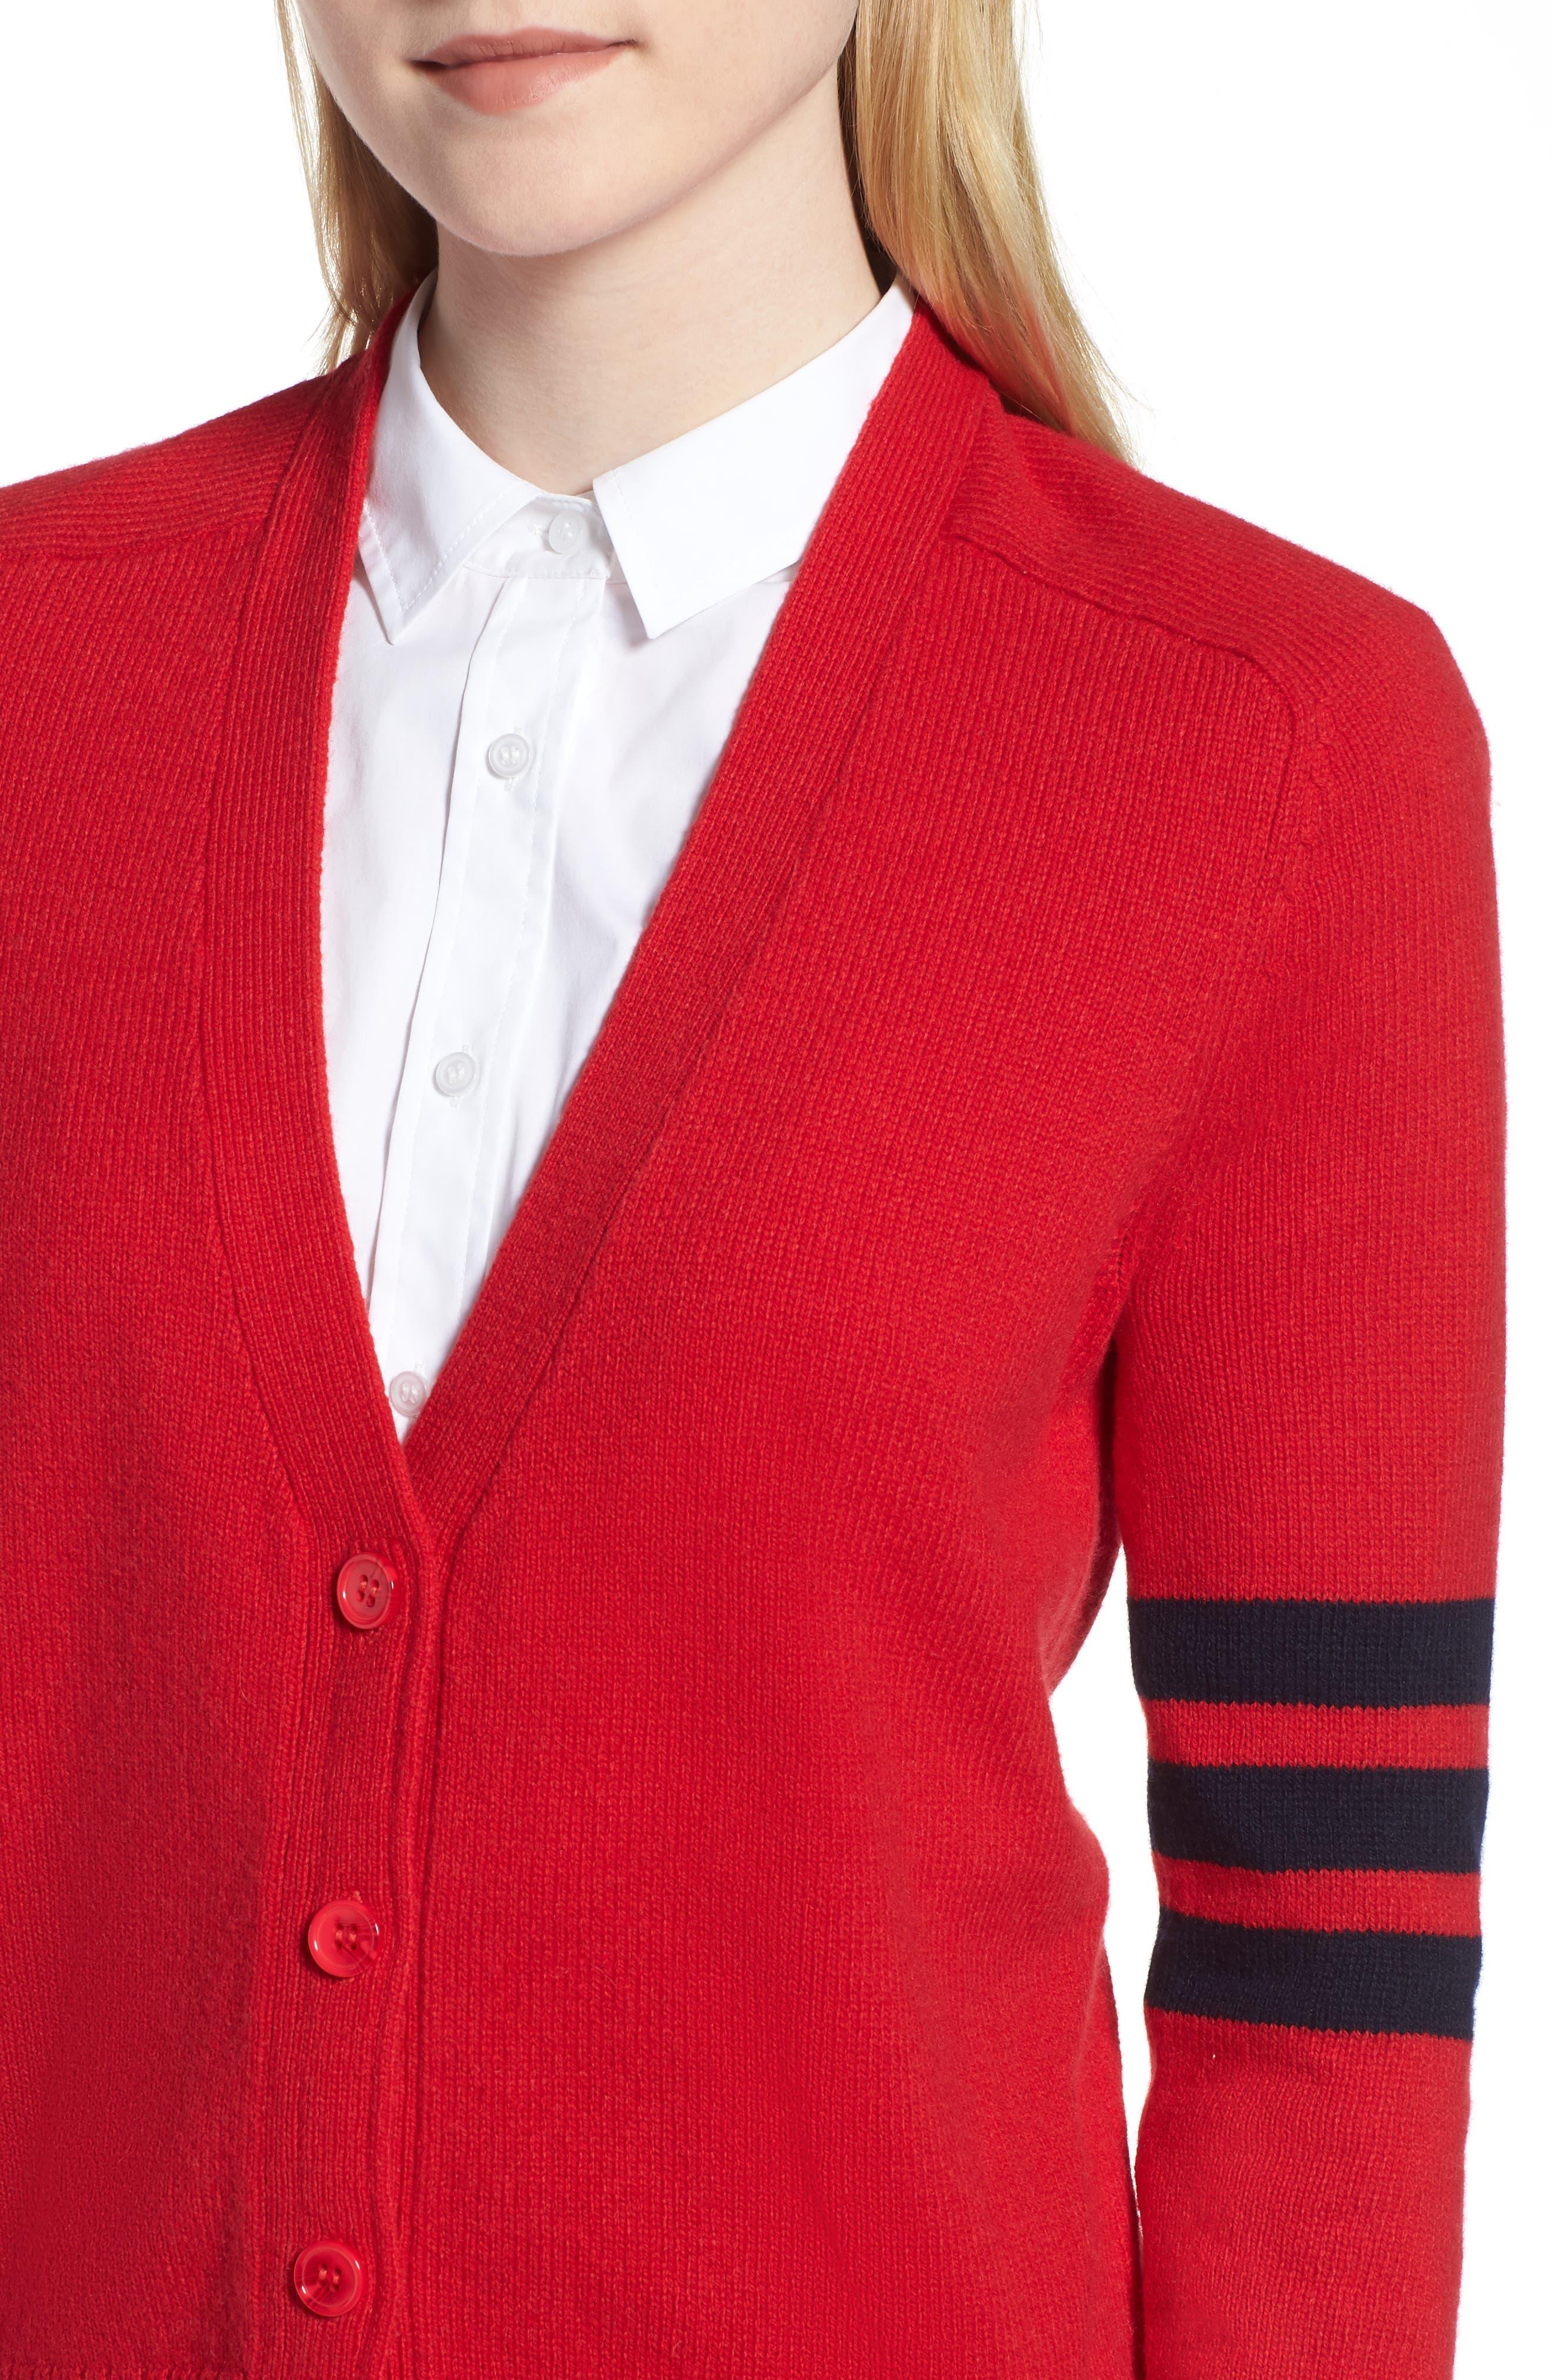 Preppy V-Neck Cardigan,                             Alternate thumbnail 4, color,                             Red- Navy Combo